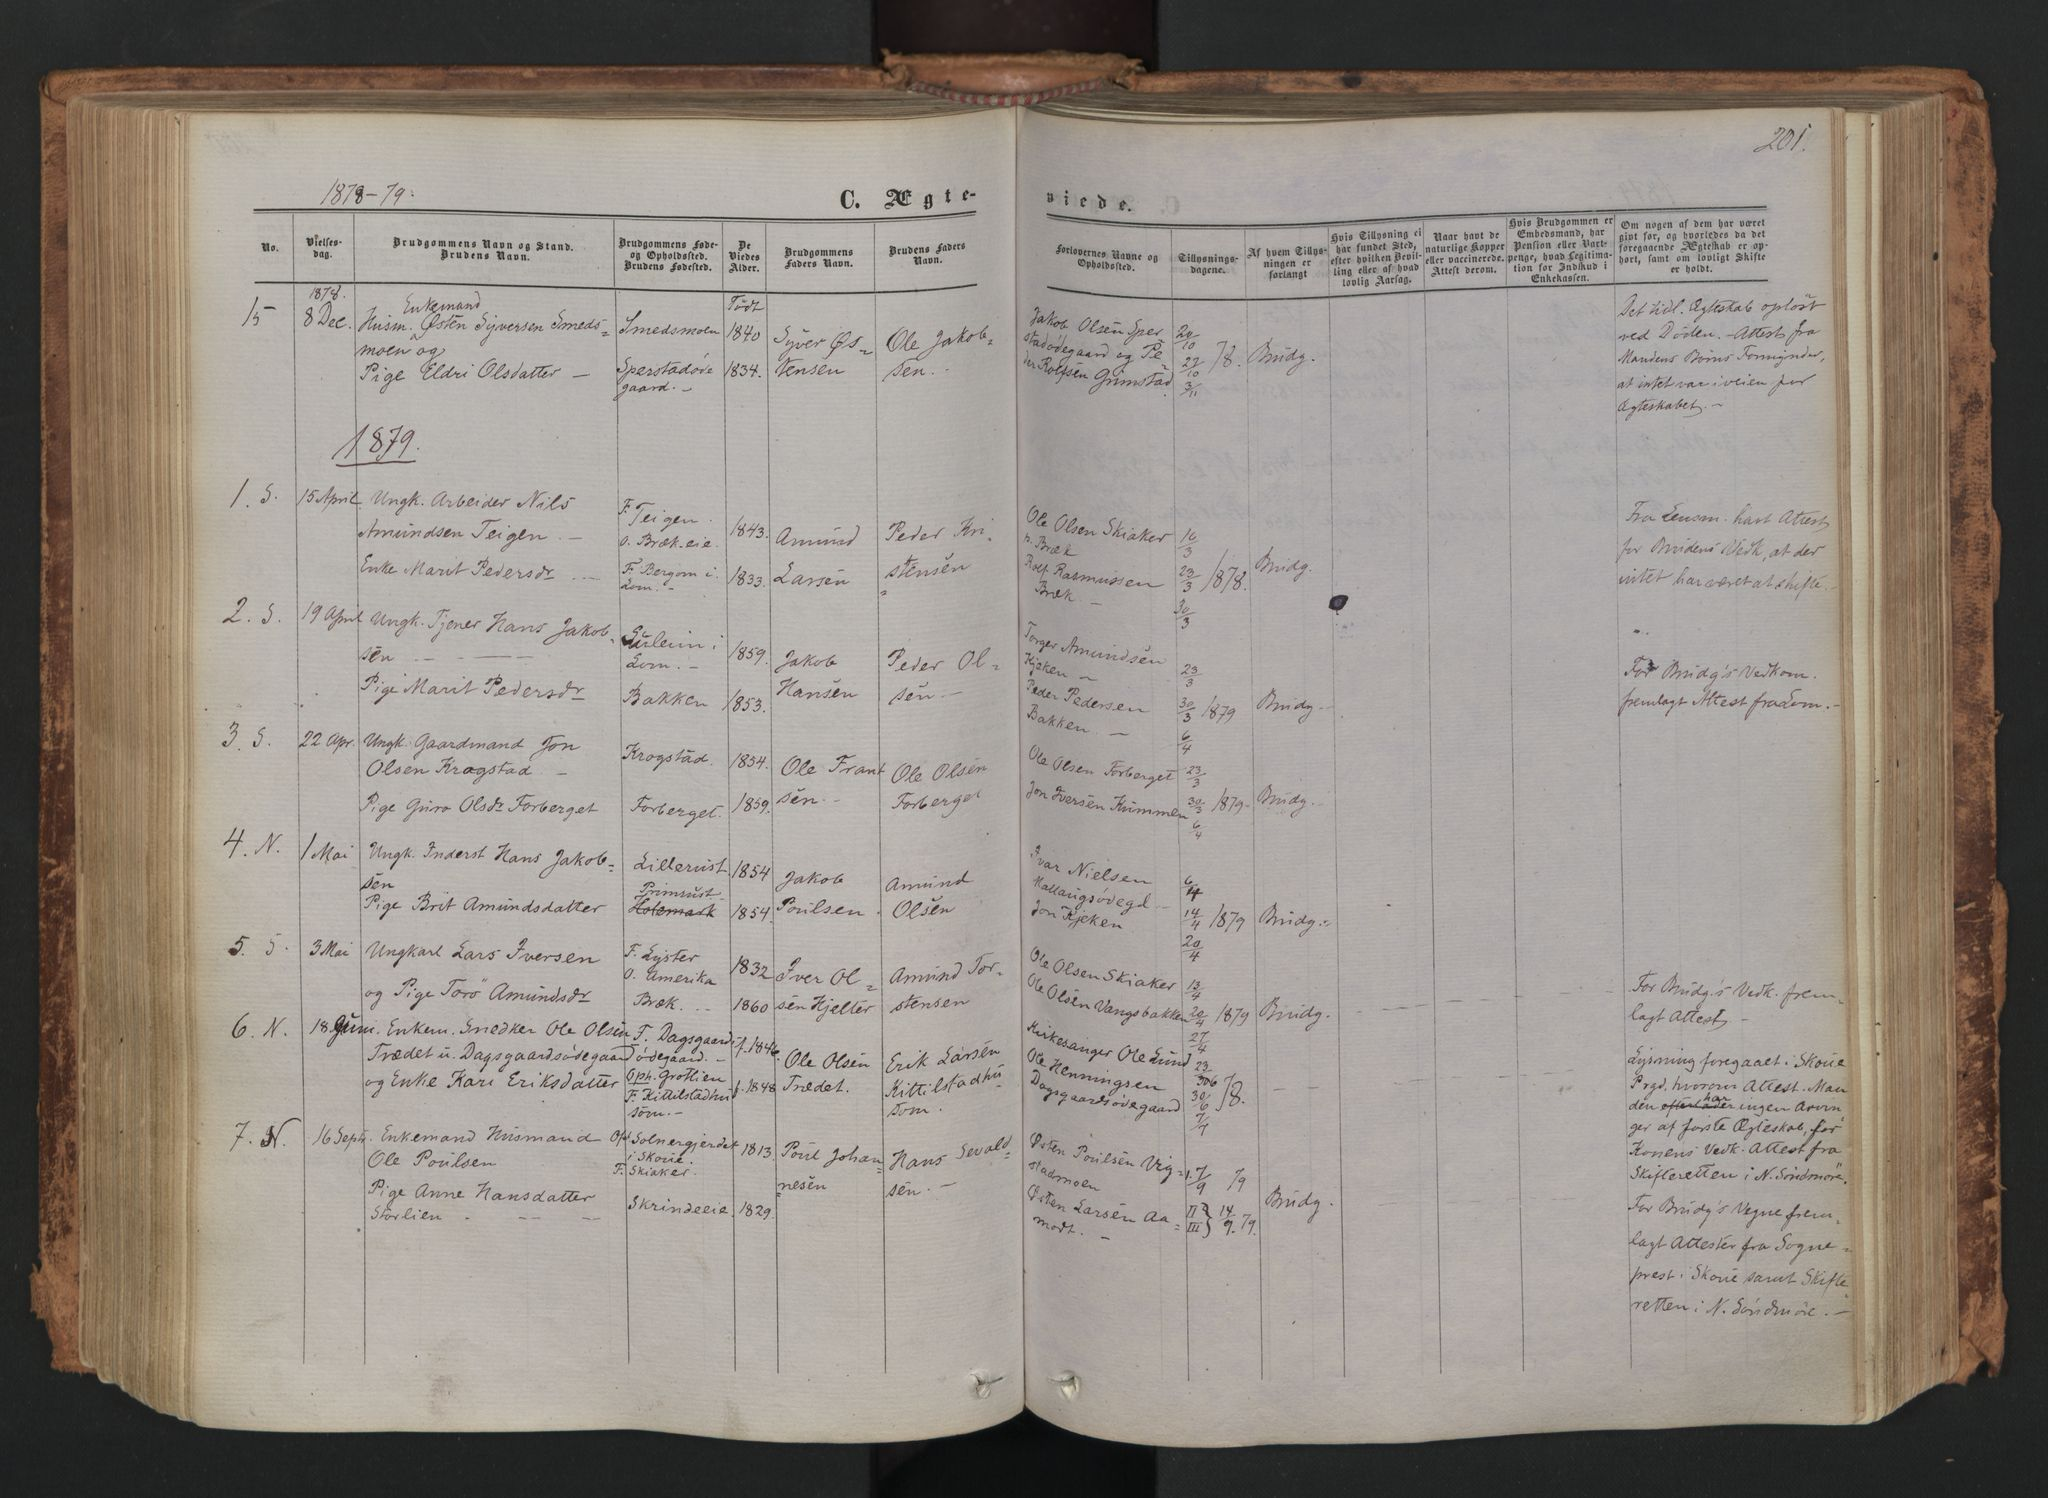 SAH, Skjåk prestekontor, Ministerialbok nr. 1, 1863-1879, s. 201